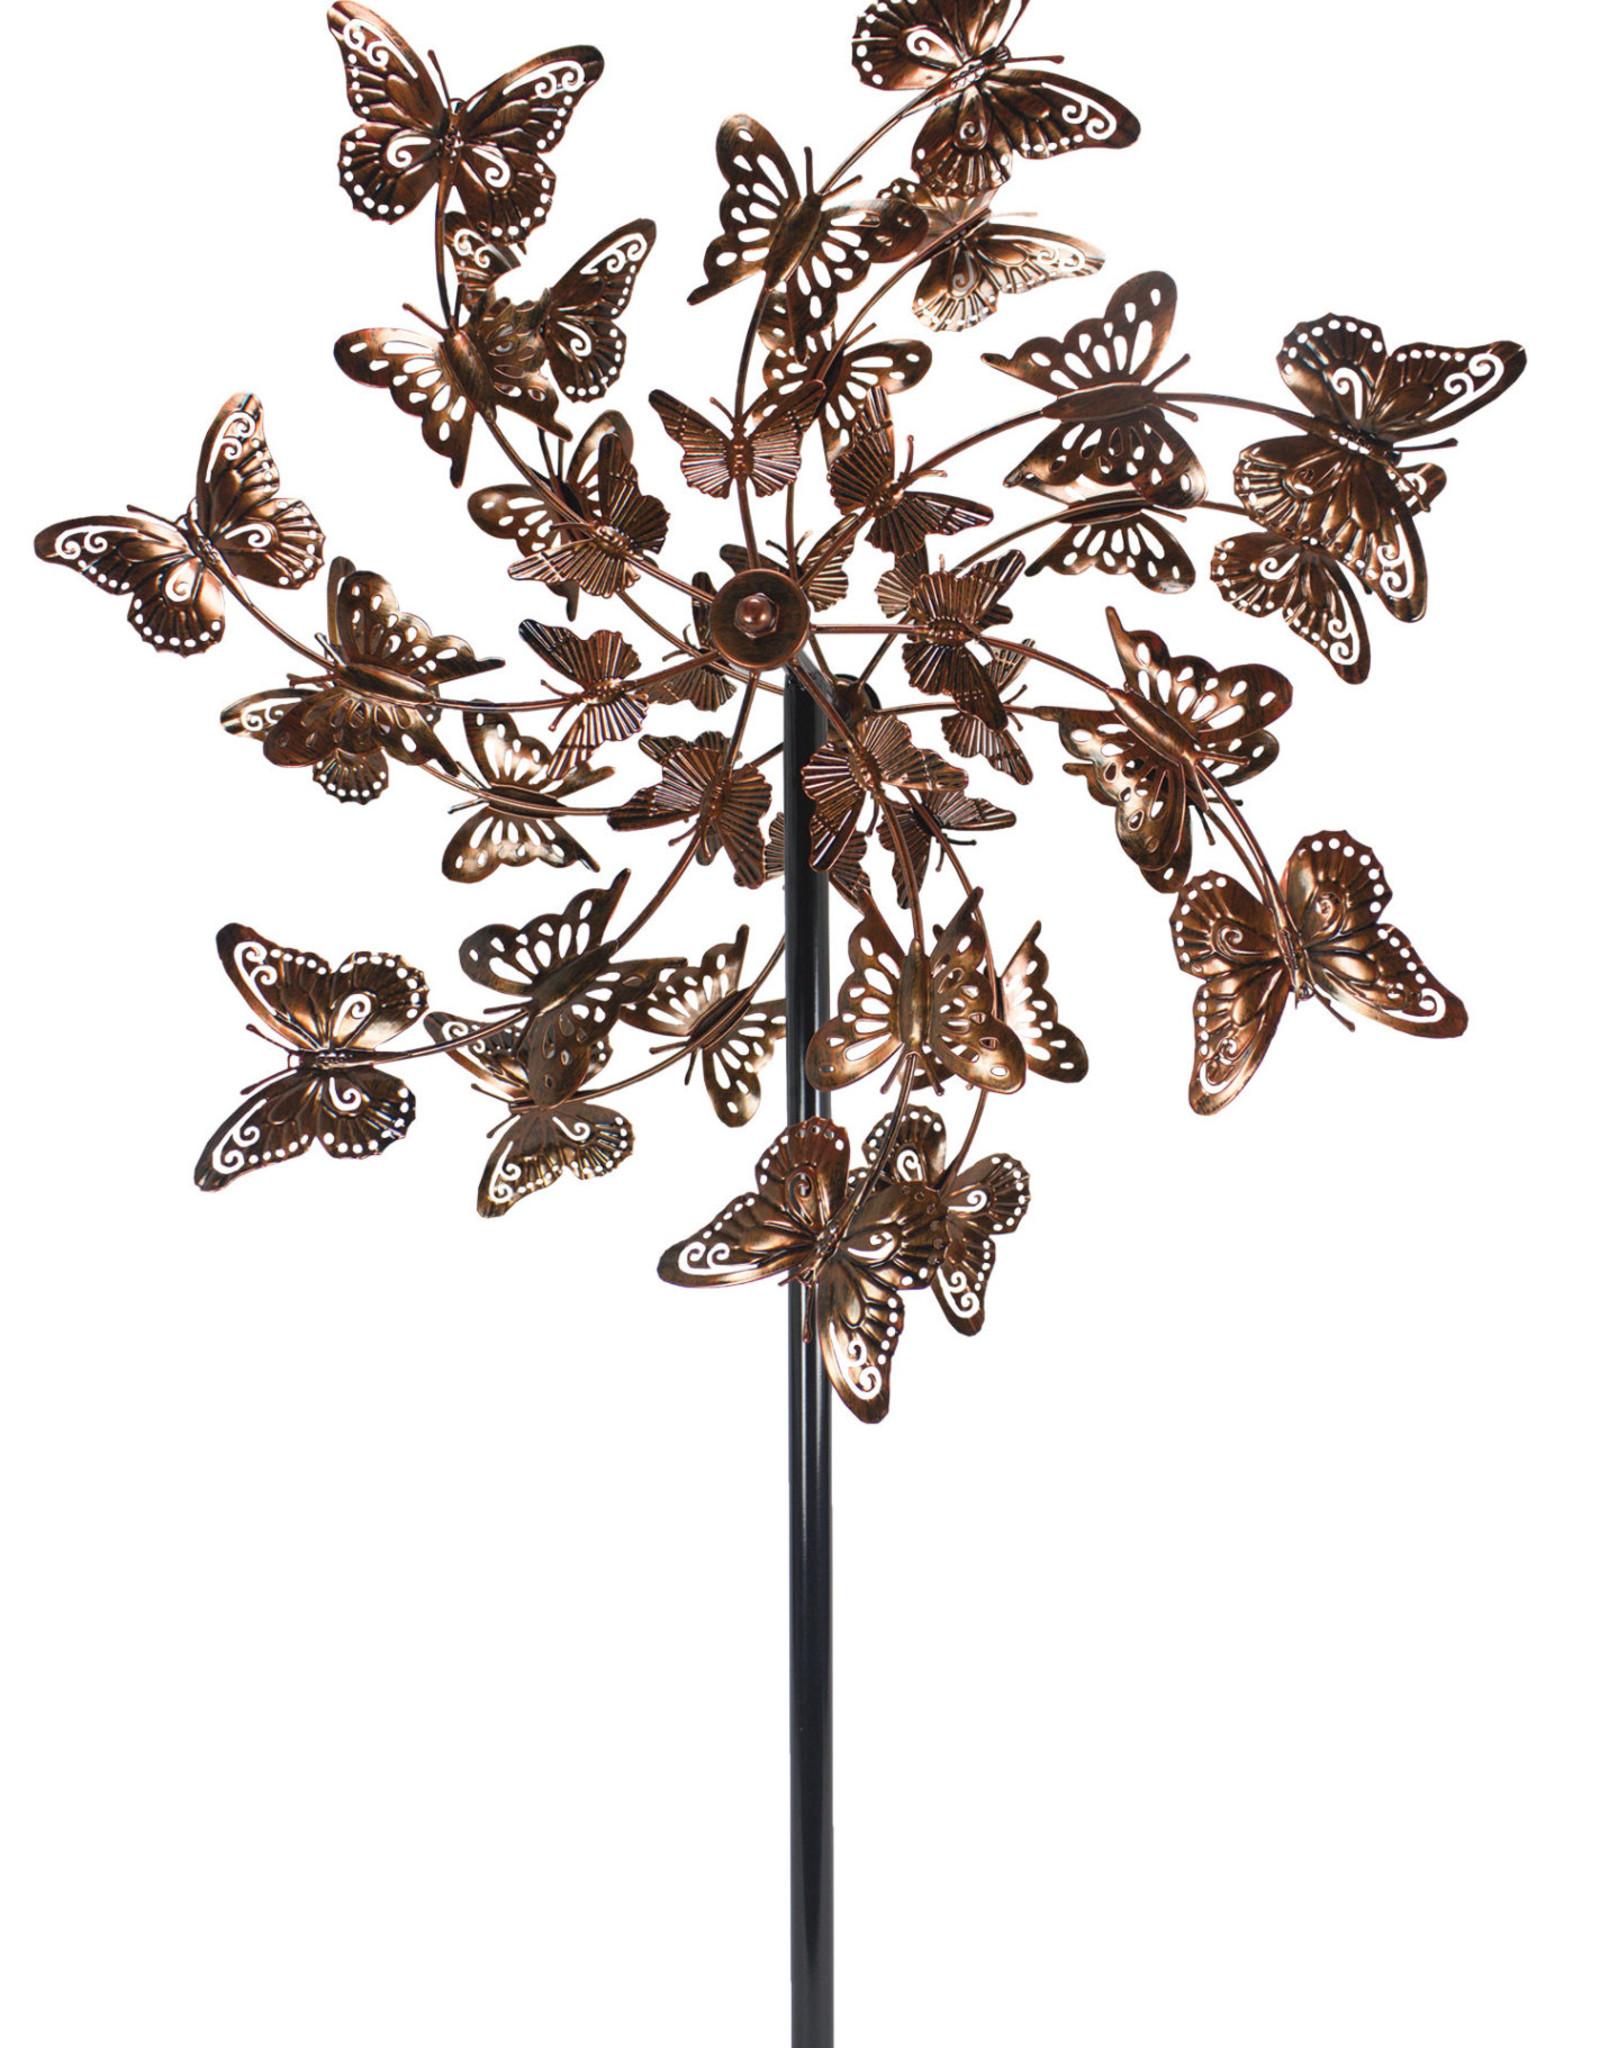 Kinetic Wind Spinner Stake - Bronze Butterfly